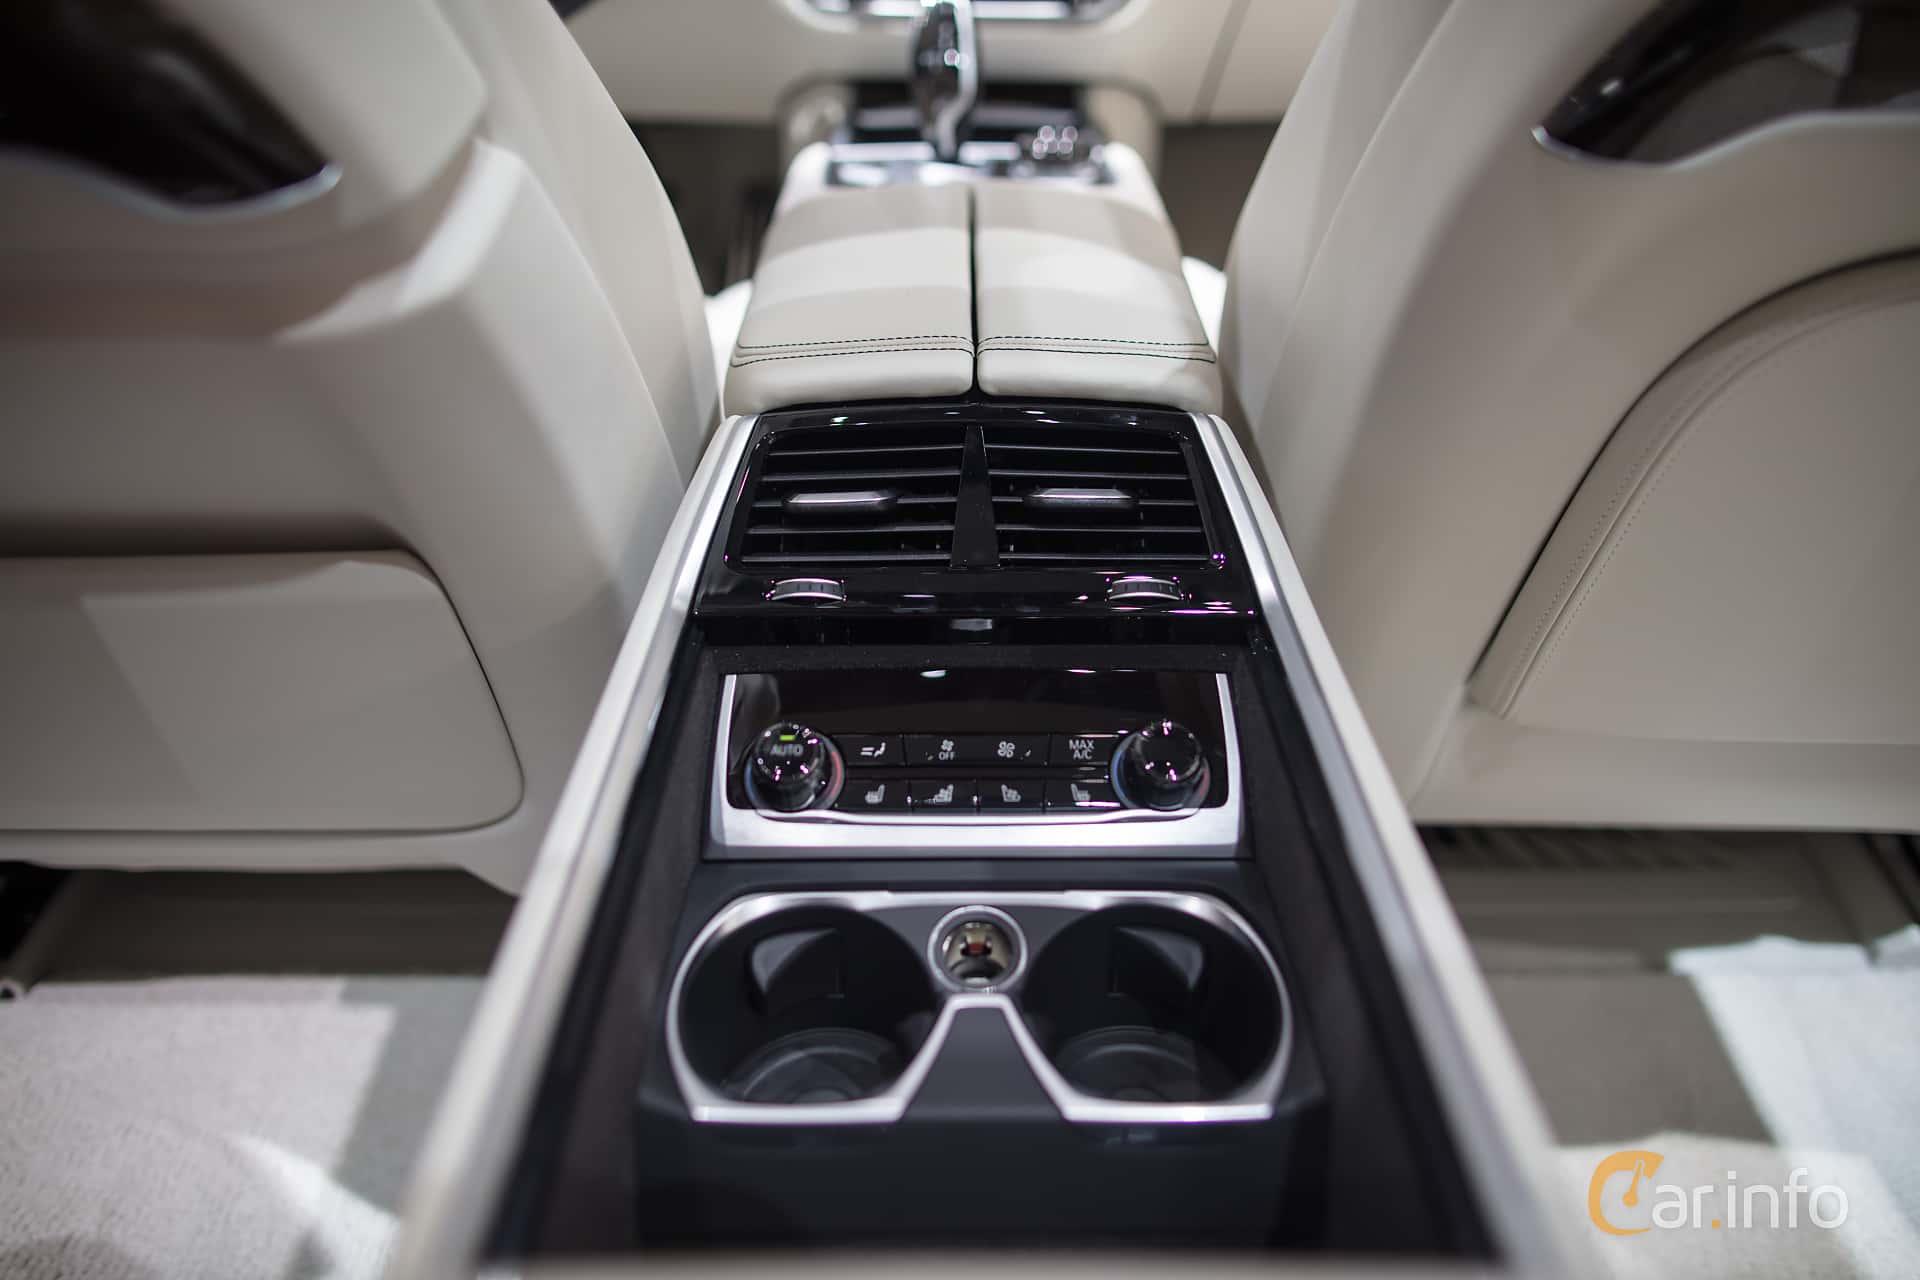 BMW M760Li XDrive 66 V12 Steptronic 610hp 2017 At Geneva Motor Show